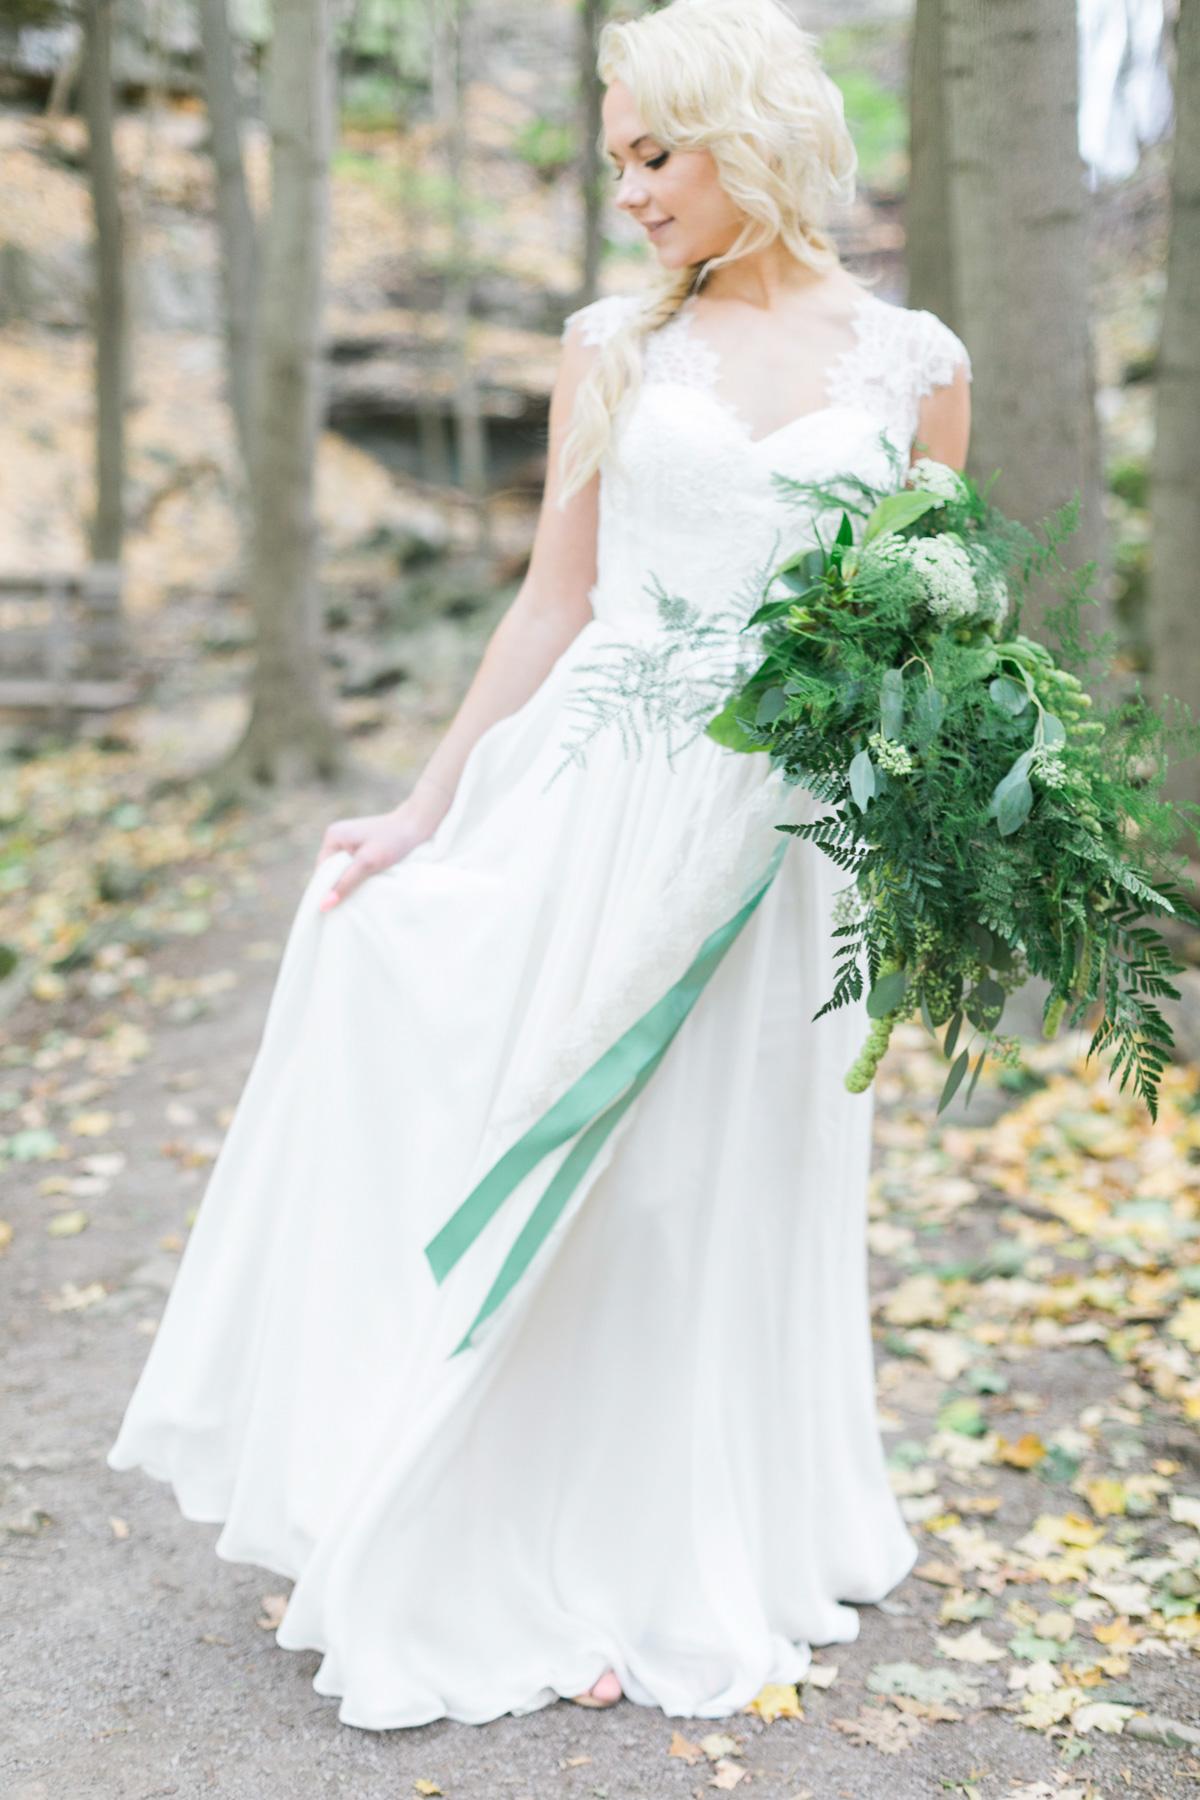 melissa-northcott-photography-vineyard-bride-swish-list-hamilton-waterfall-editorial-13.jpg